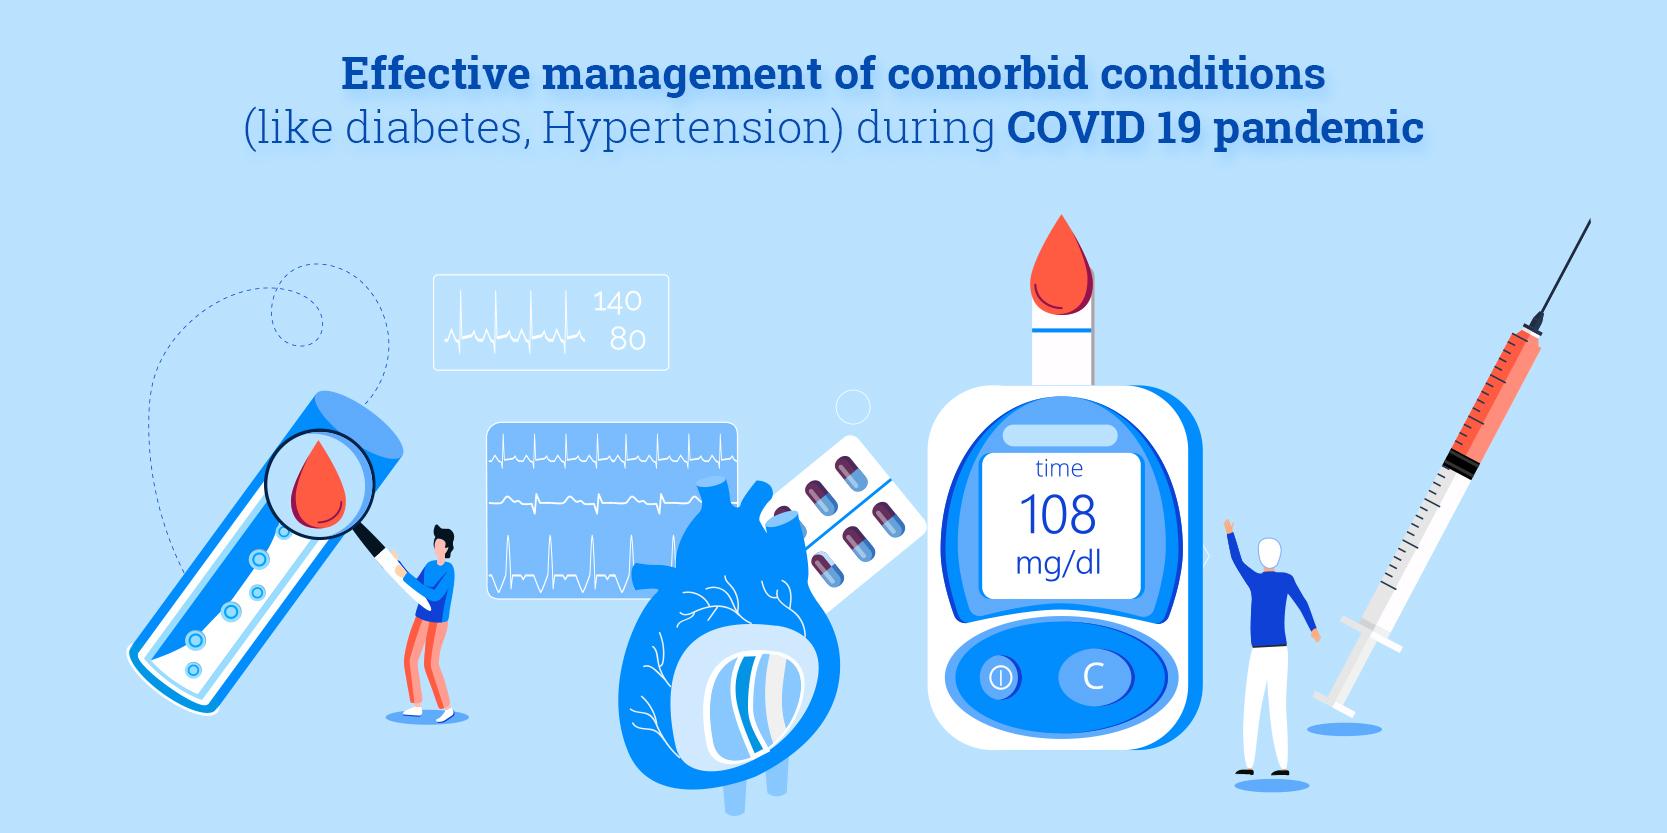 Managing comorbidities during COVID 19